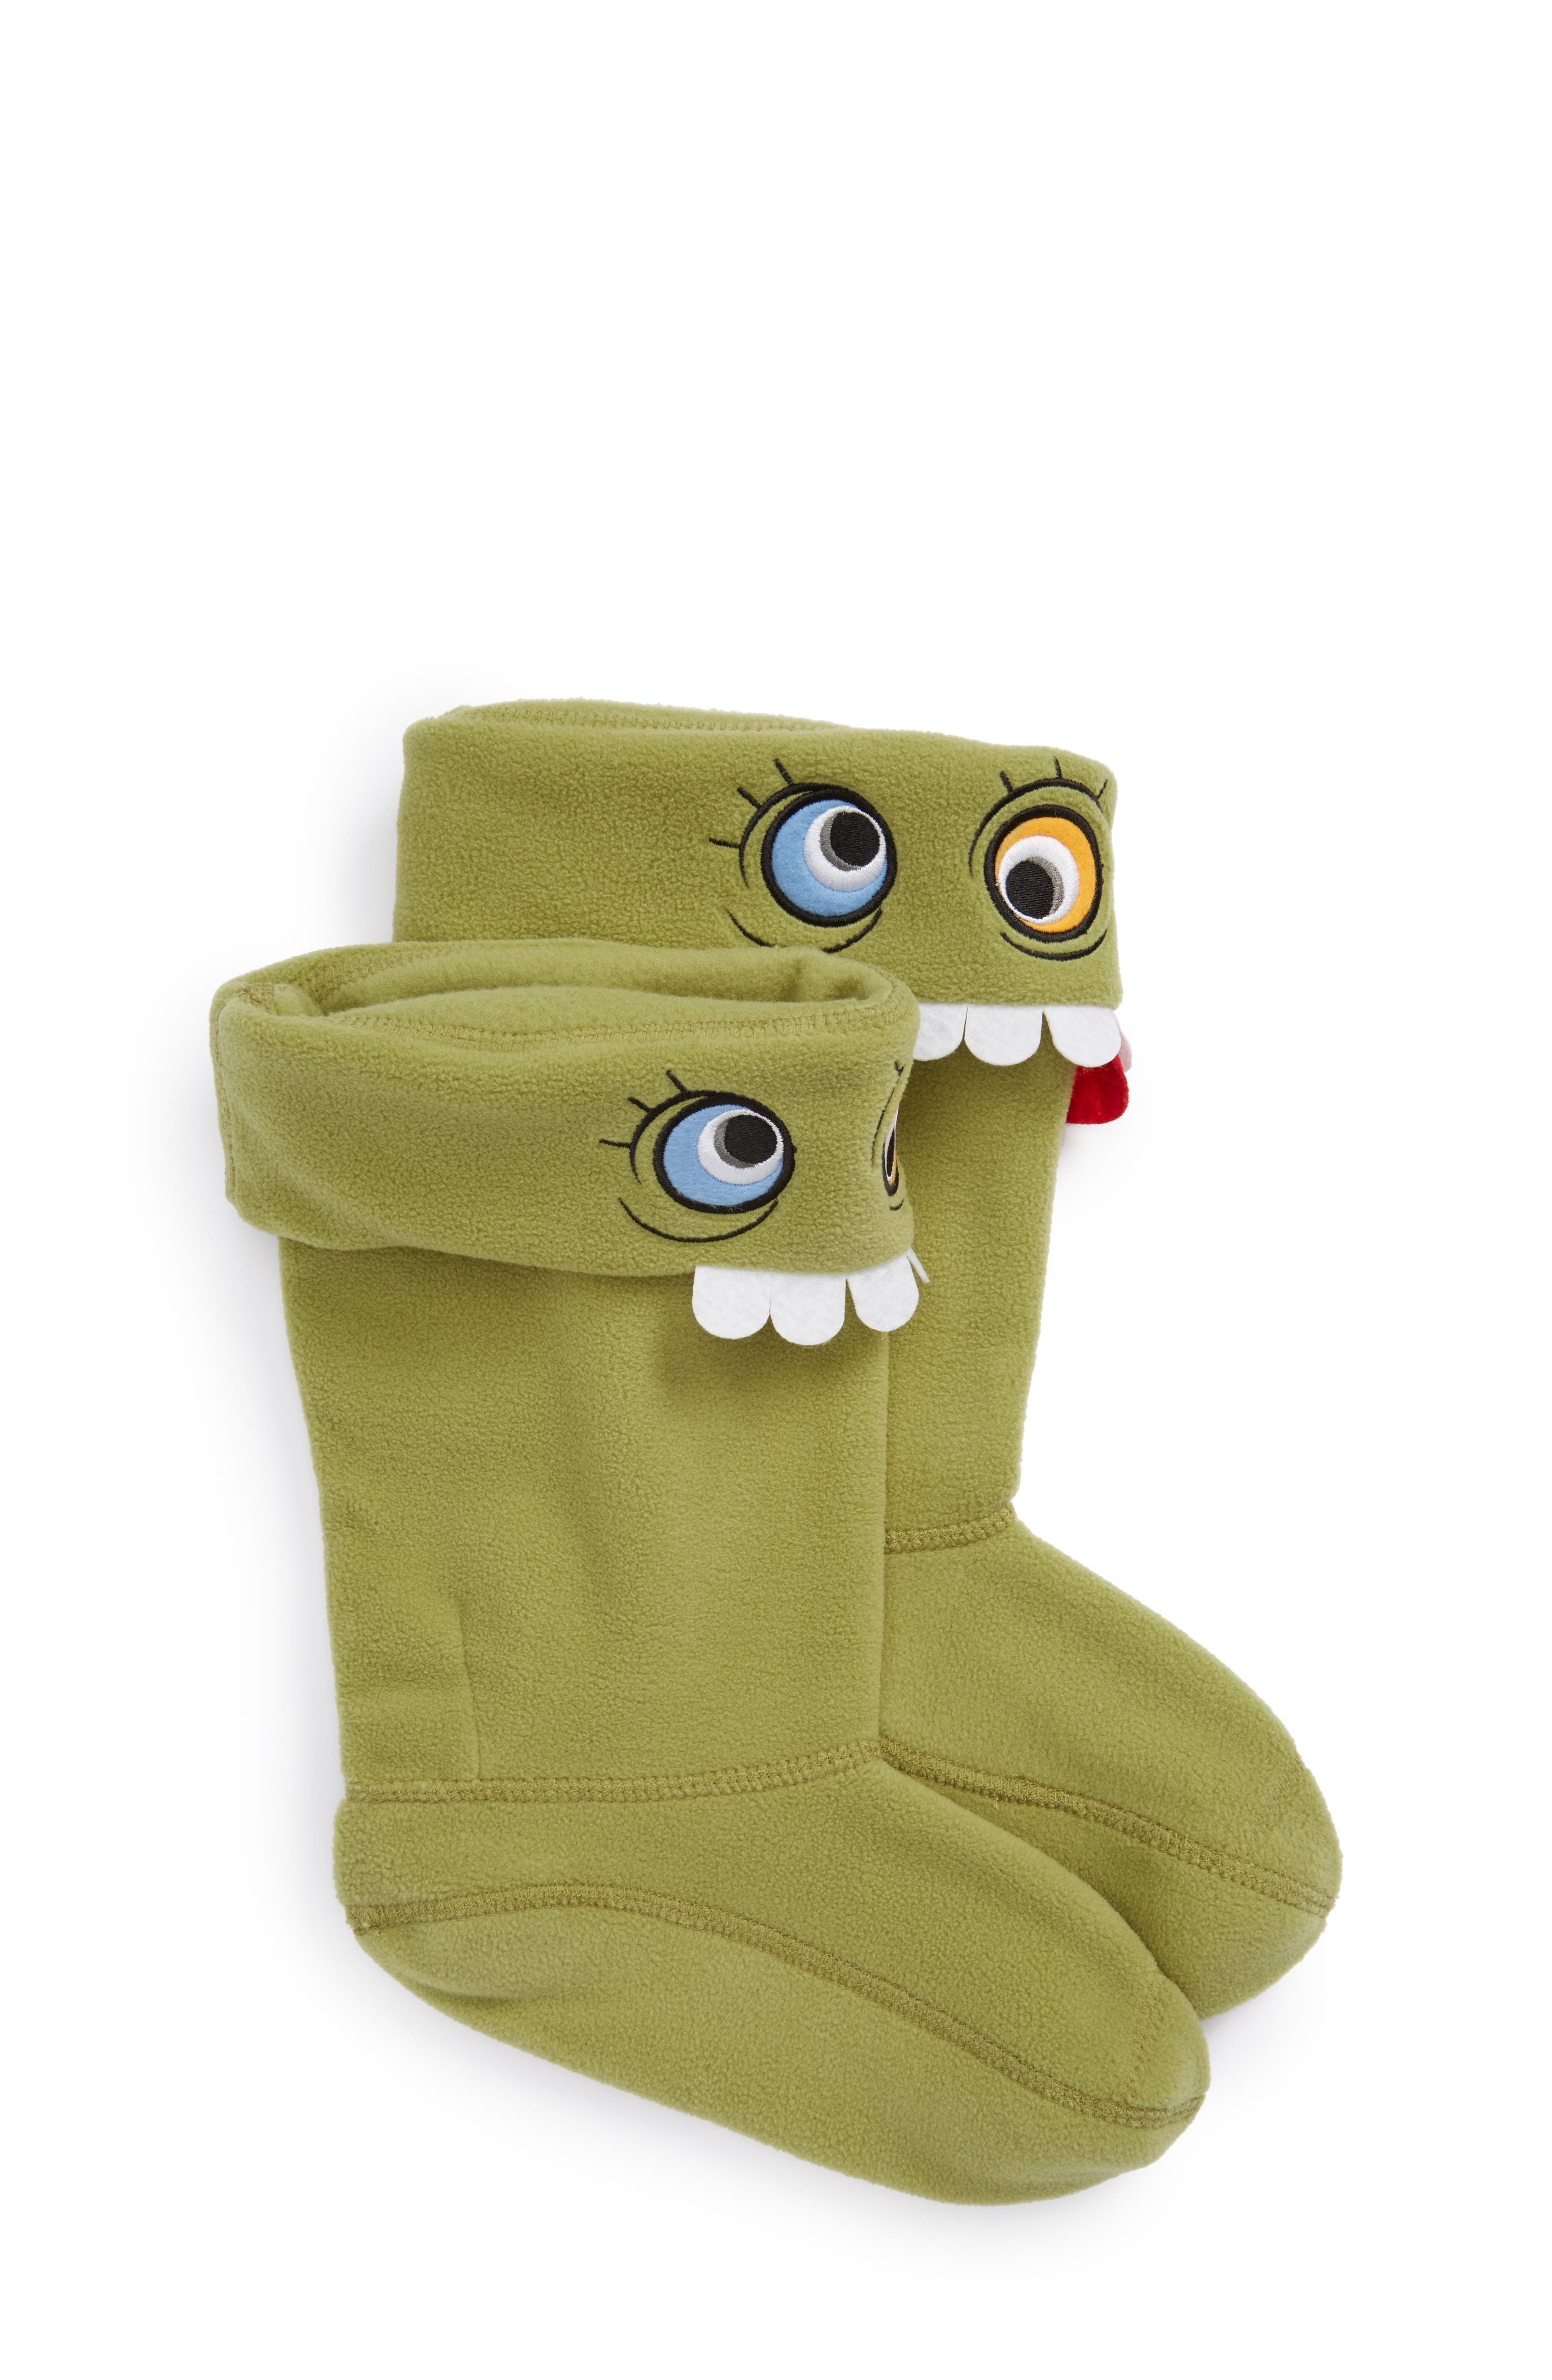 Alien Cuff Boot Socks,                             Main thumbnail 1, color,